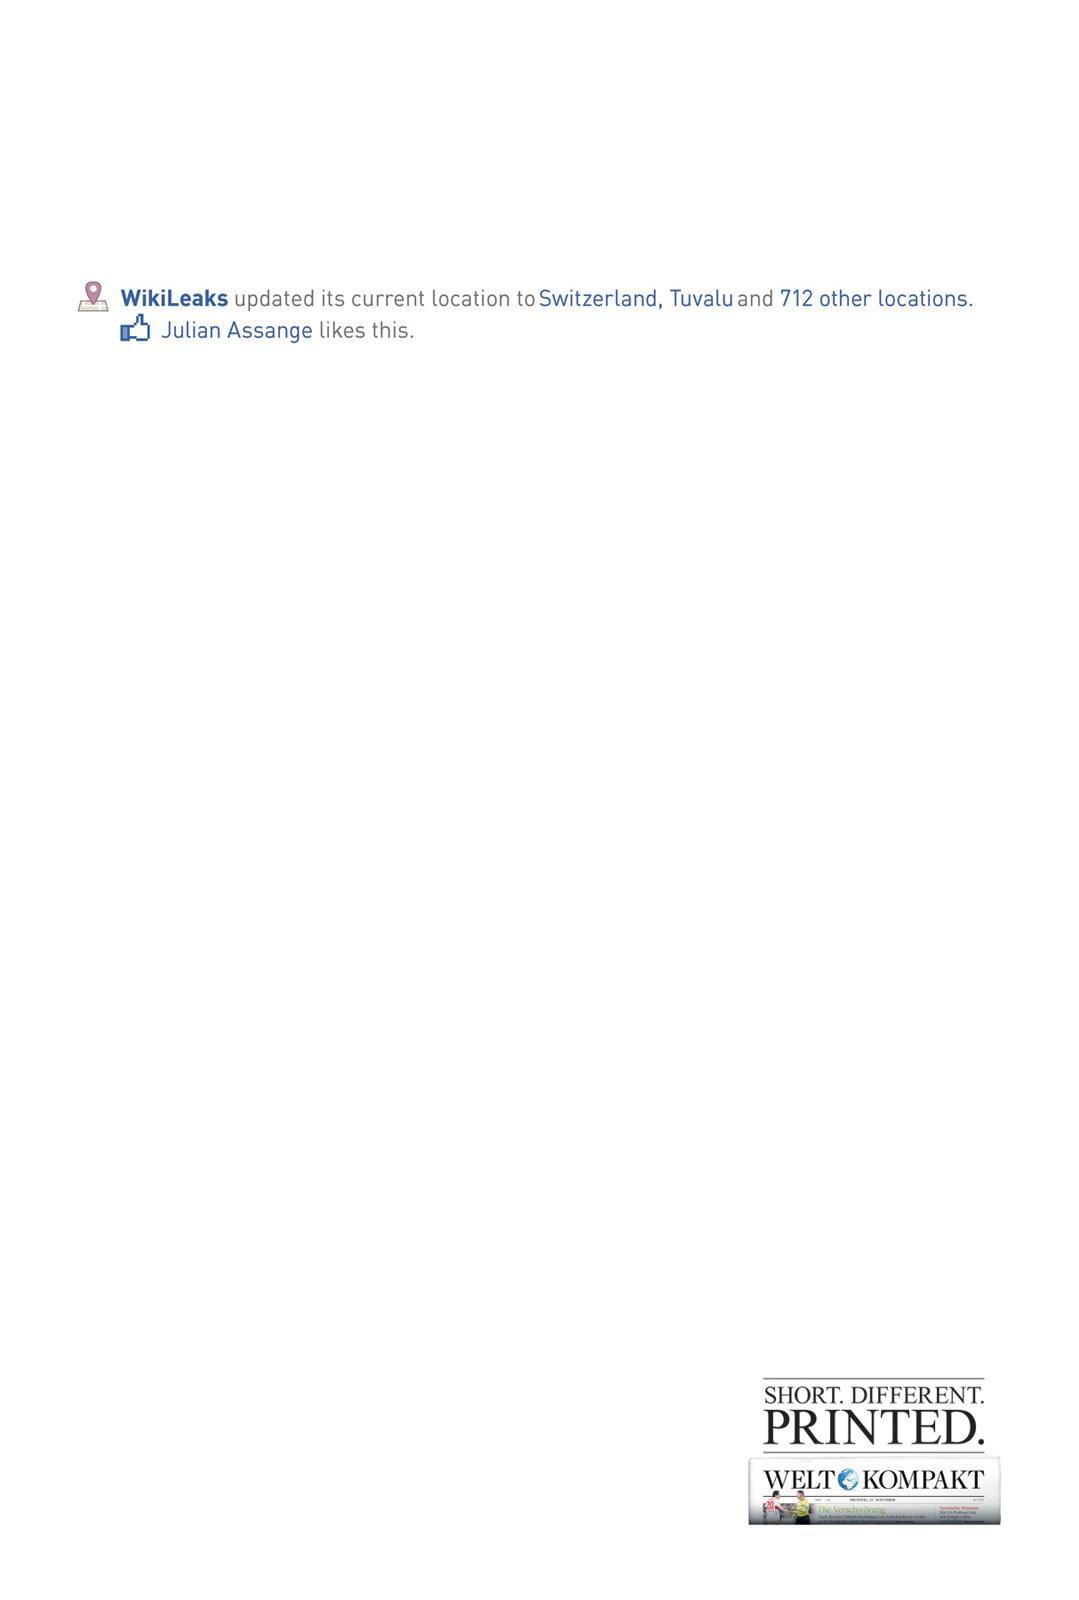 Welt Kompakt Print Ad -  Server Relocation